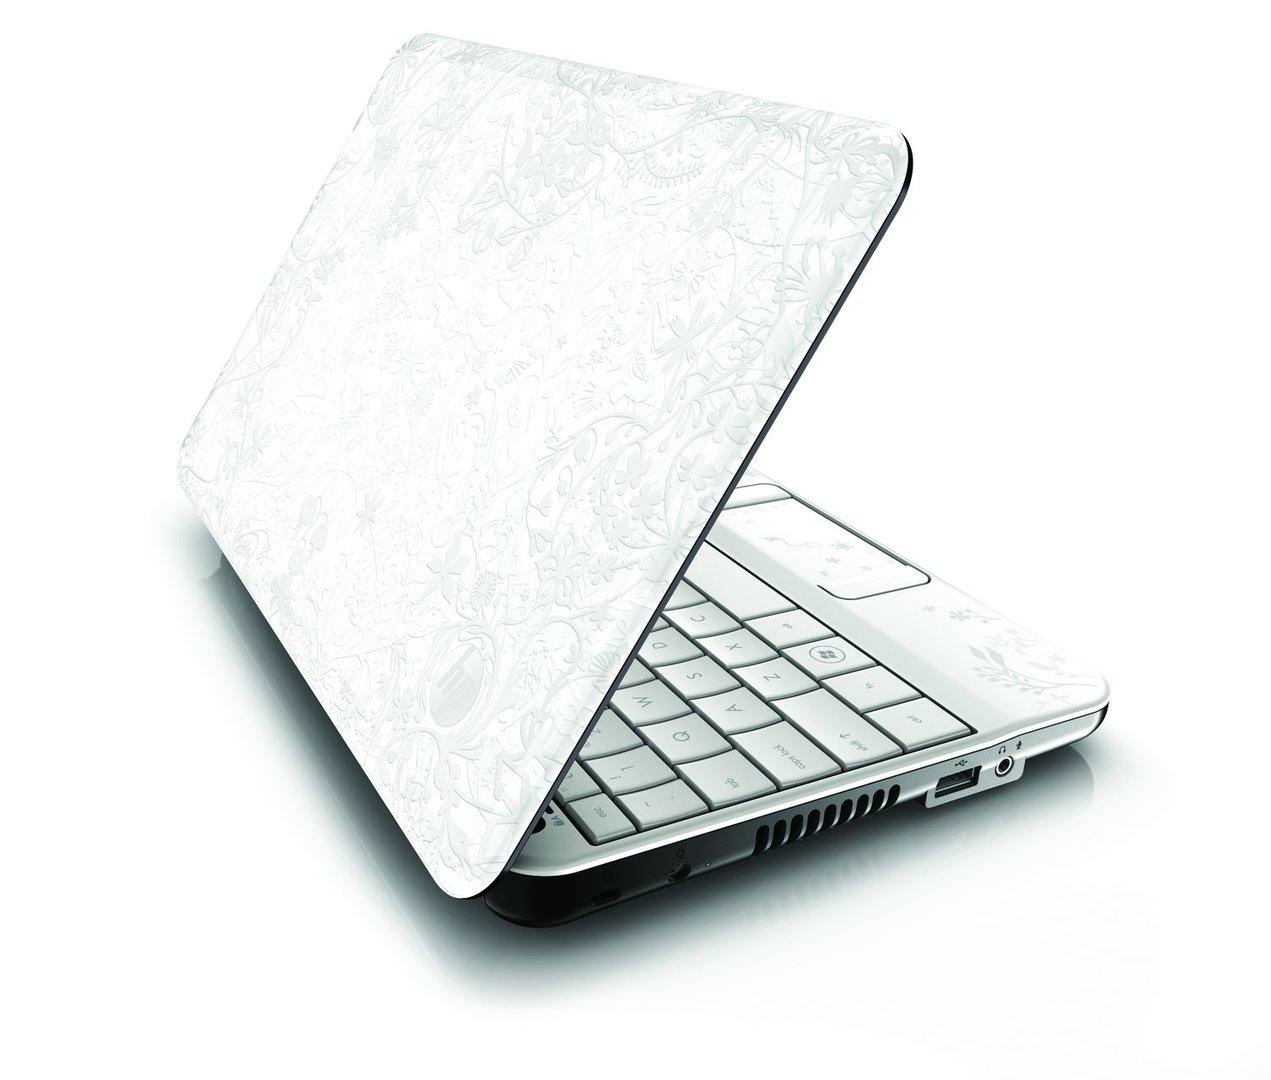 HP Mini 110 by Studio Tord Boontje